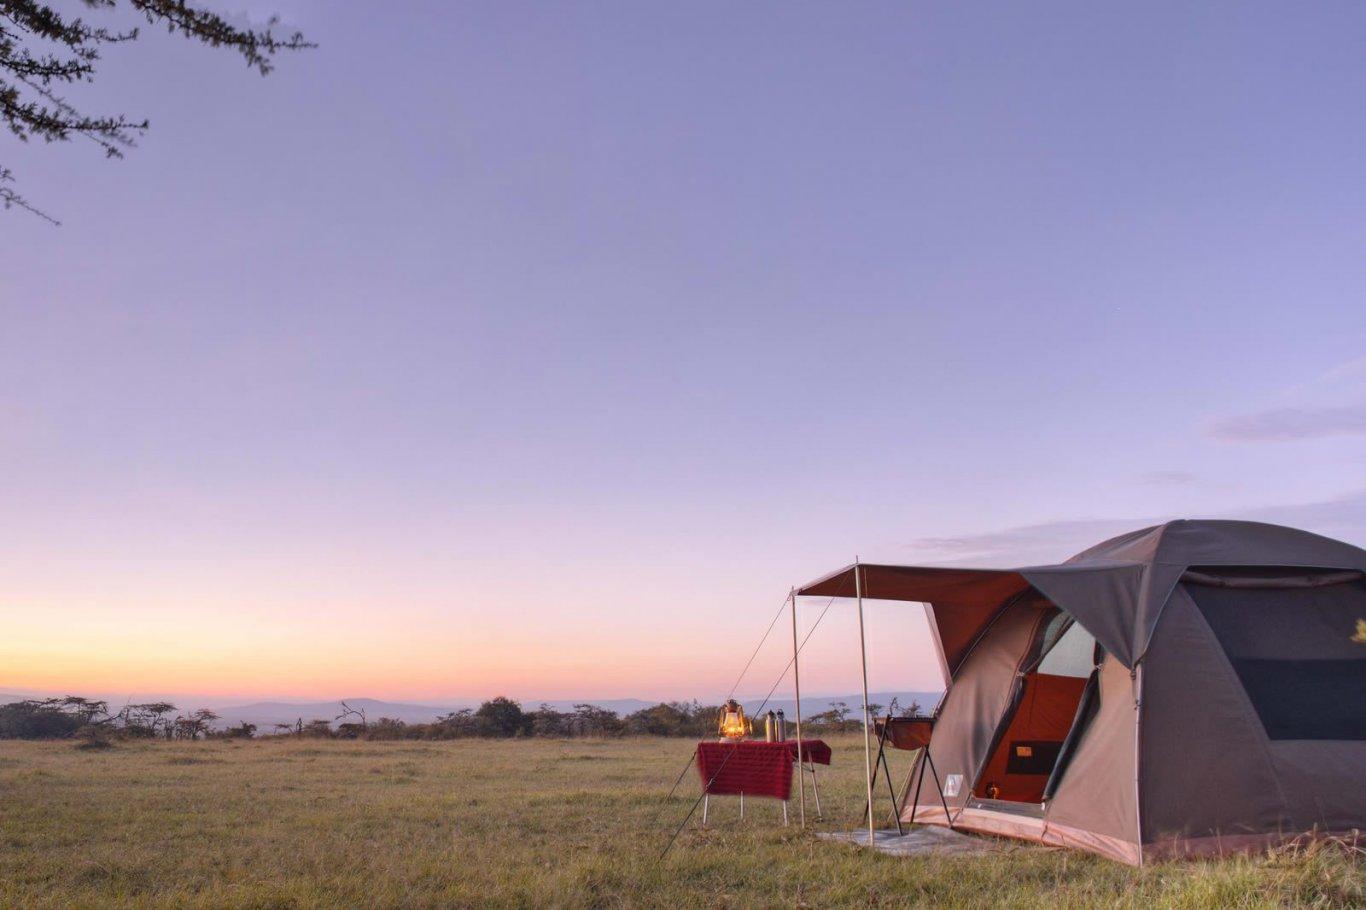 9 Day Serengeti Adventure Camping Safari